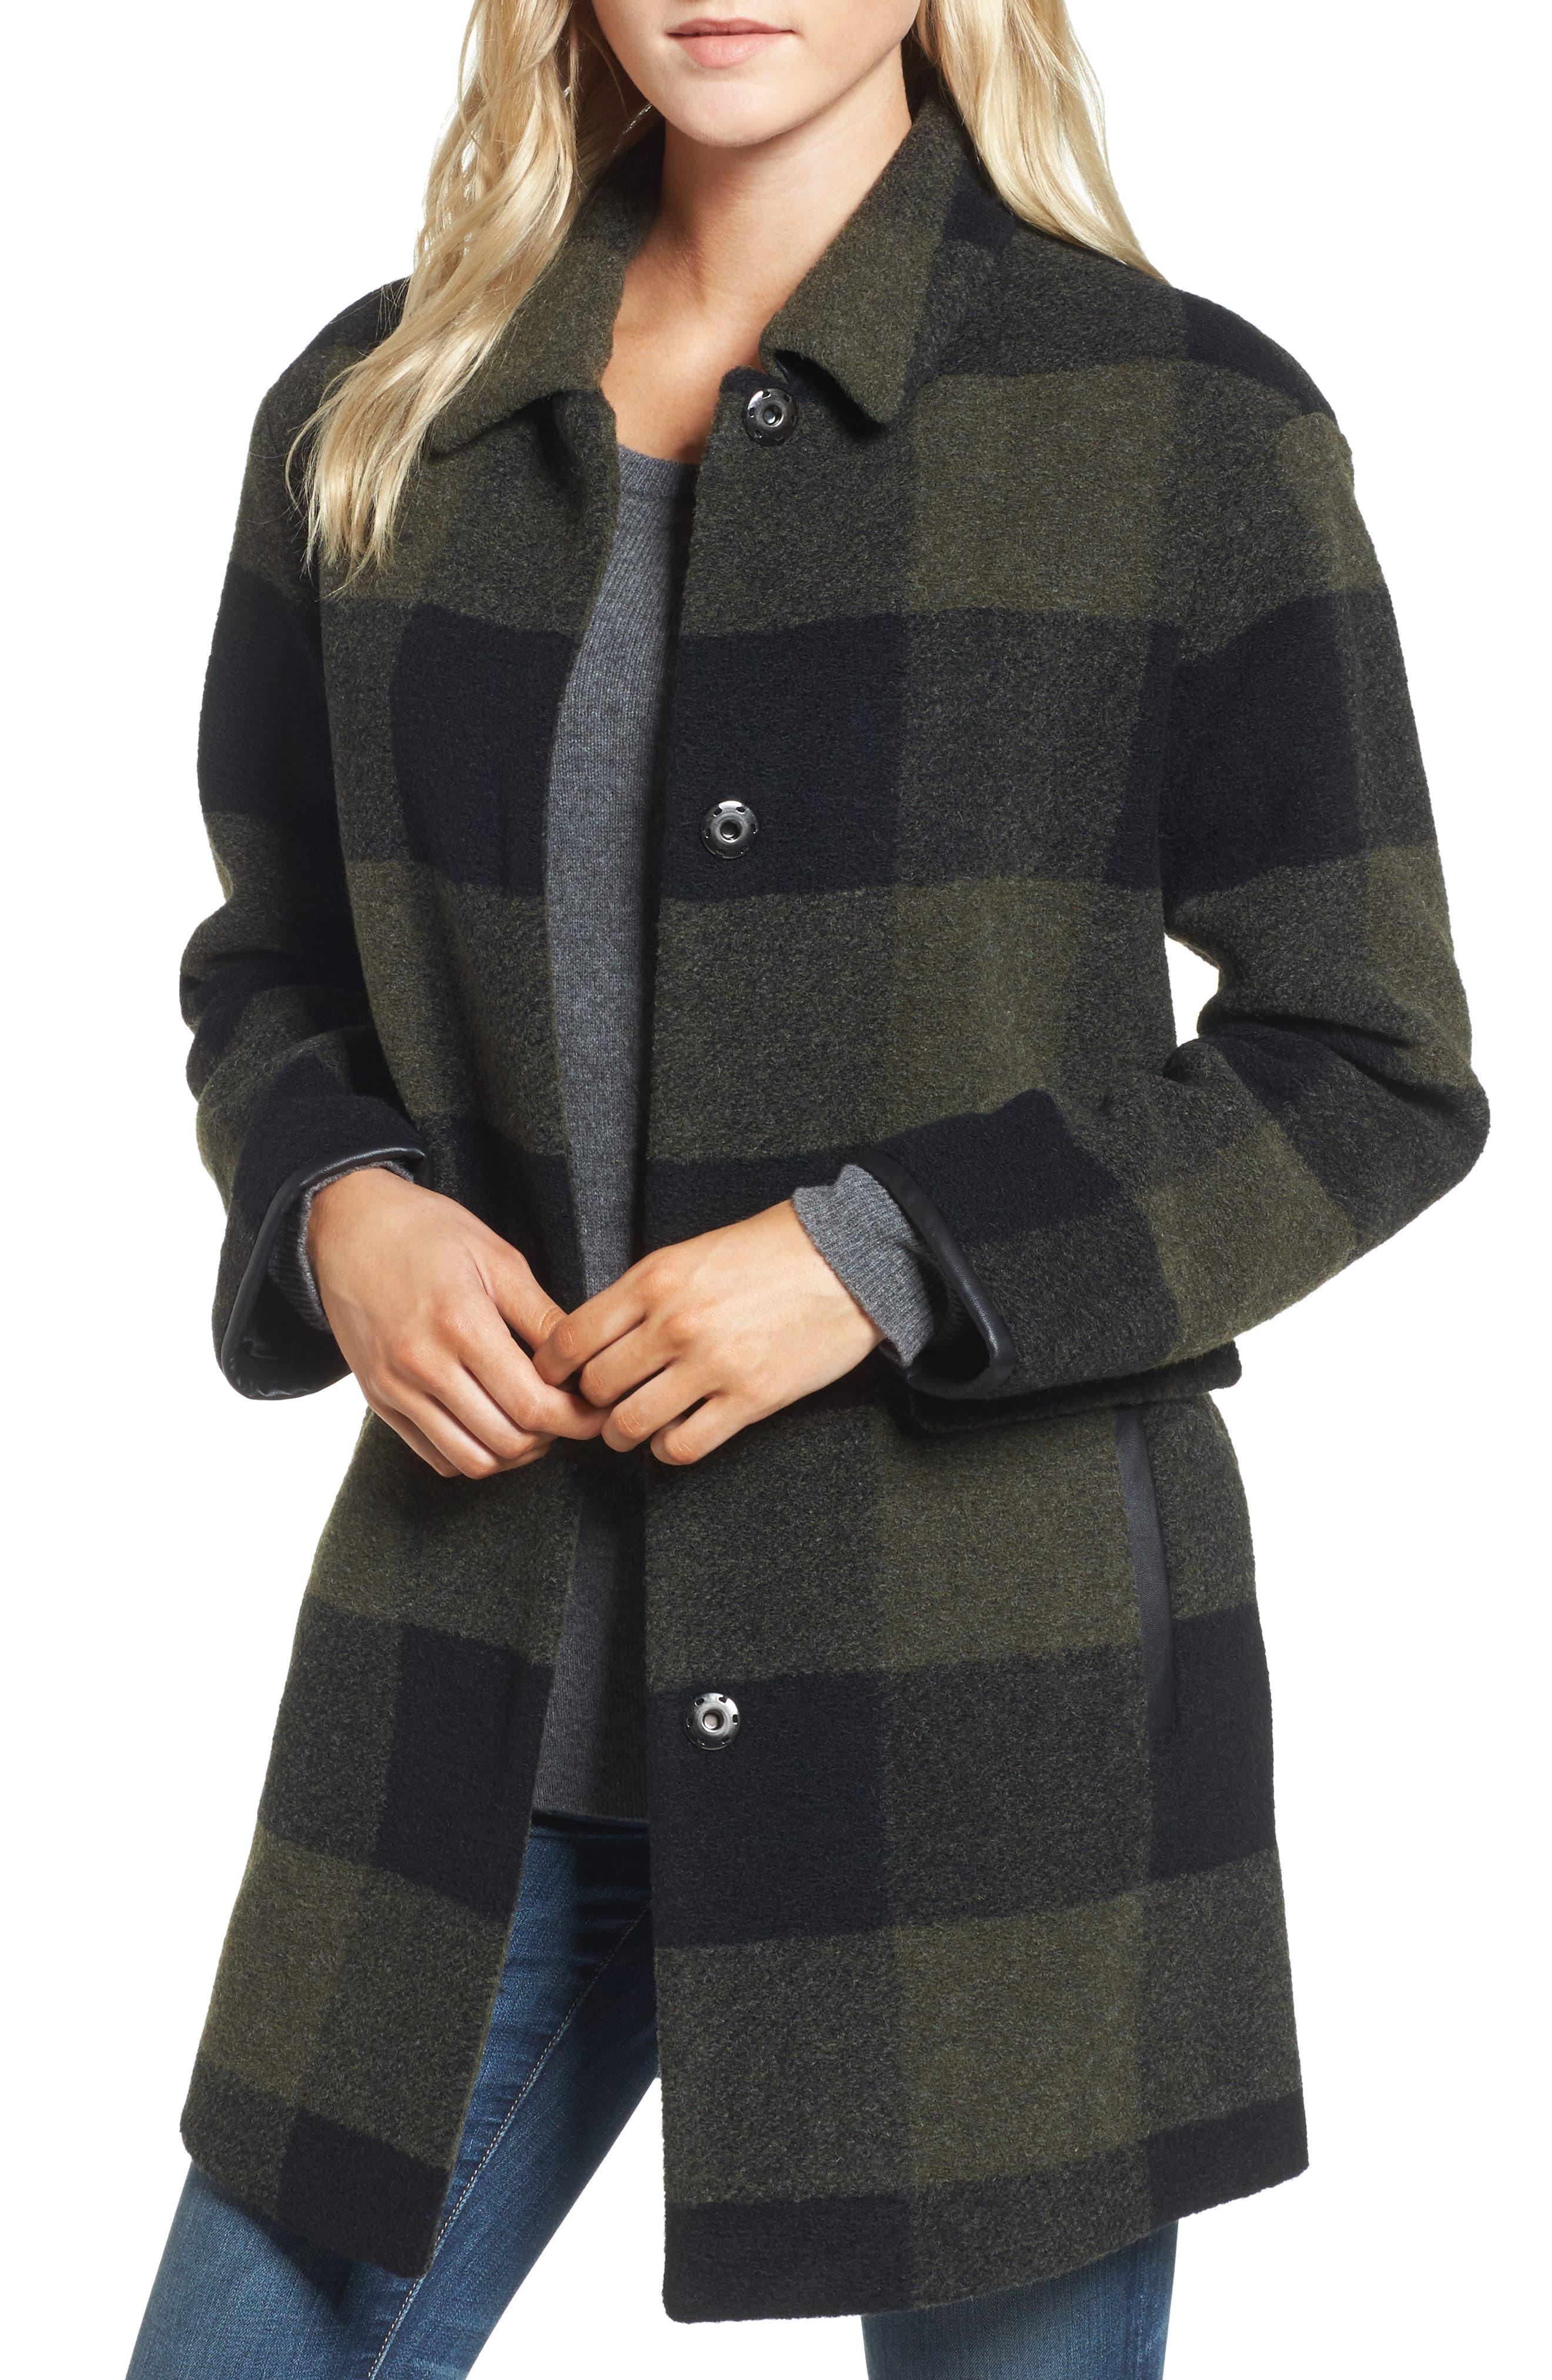 Paul Bunyan Plaid Wool Blend Barn Coat,                         Main,                         color, Olive/ Black Plaid